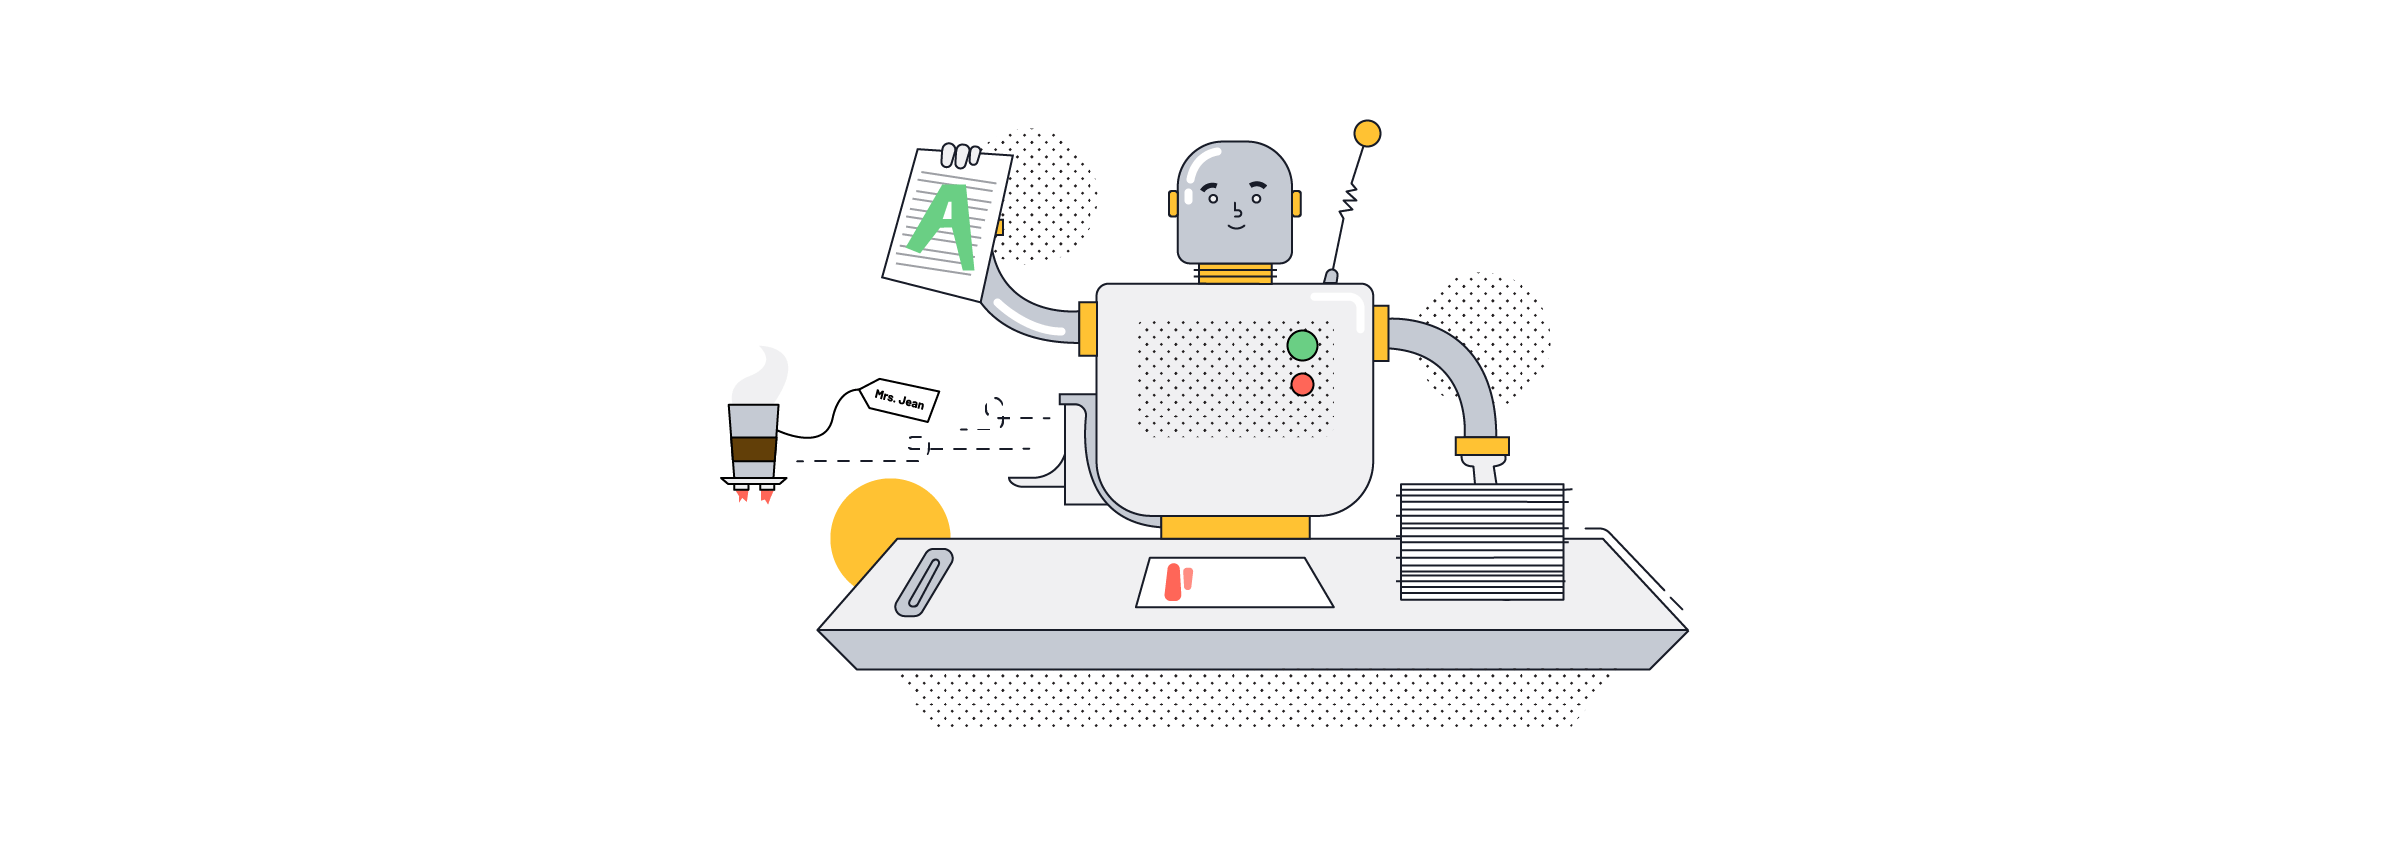 Robot correcting exams in schools